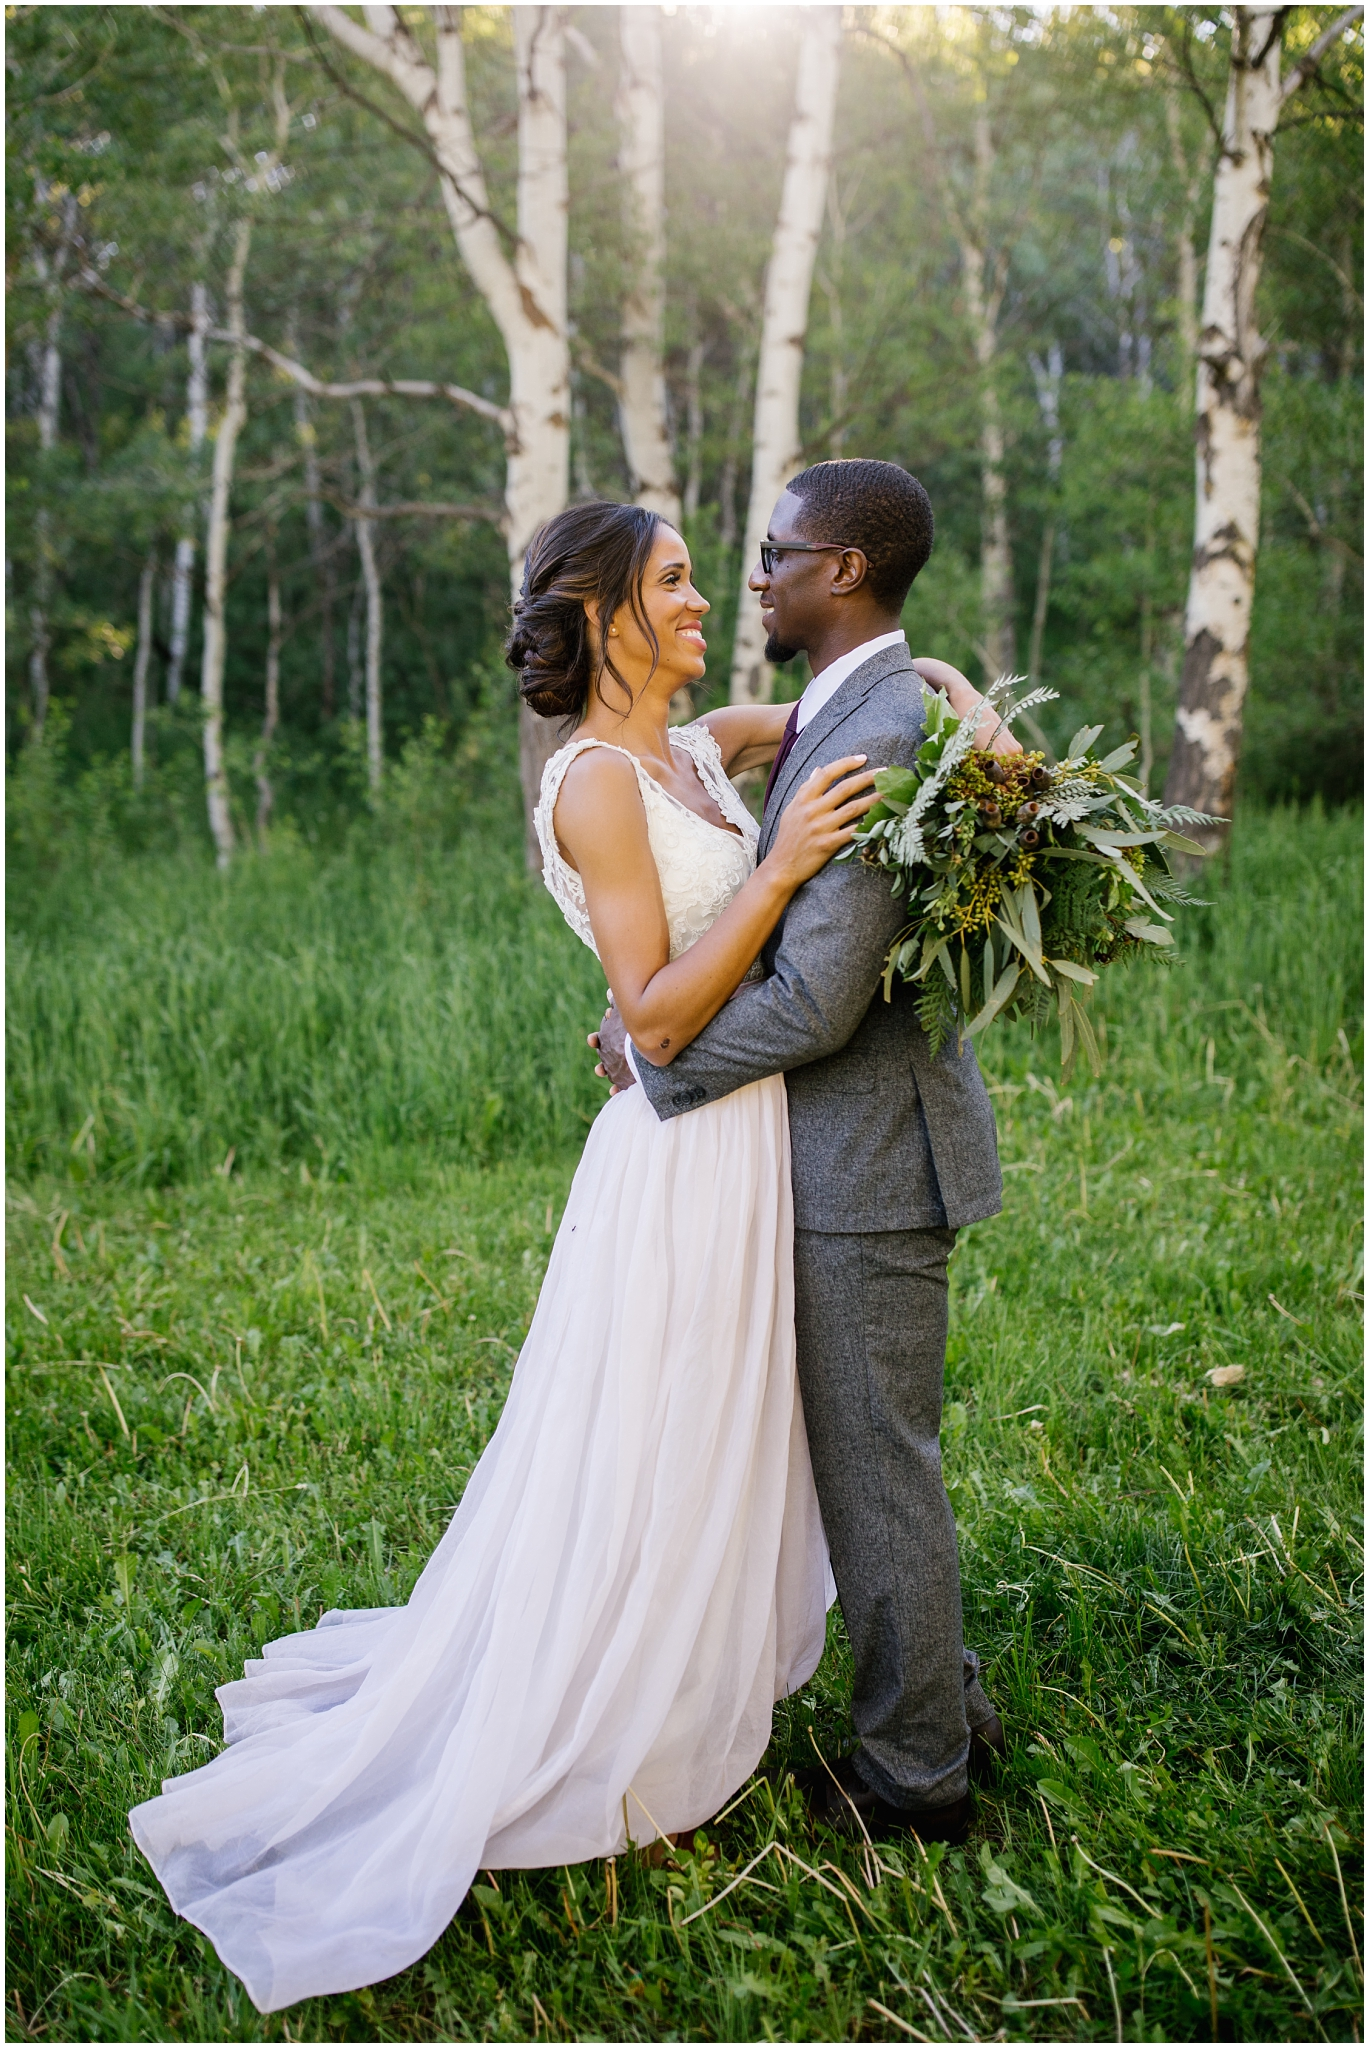 TreeHorseShoot-55_Lizzie-B-Imagery-Utah-Wedding-Photographer-Salt-Lake-City-Park-City-Oakley.jpg